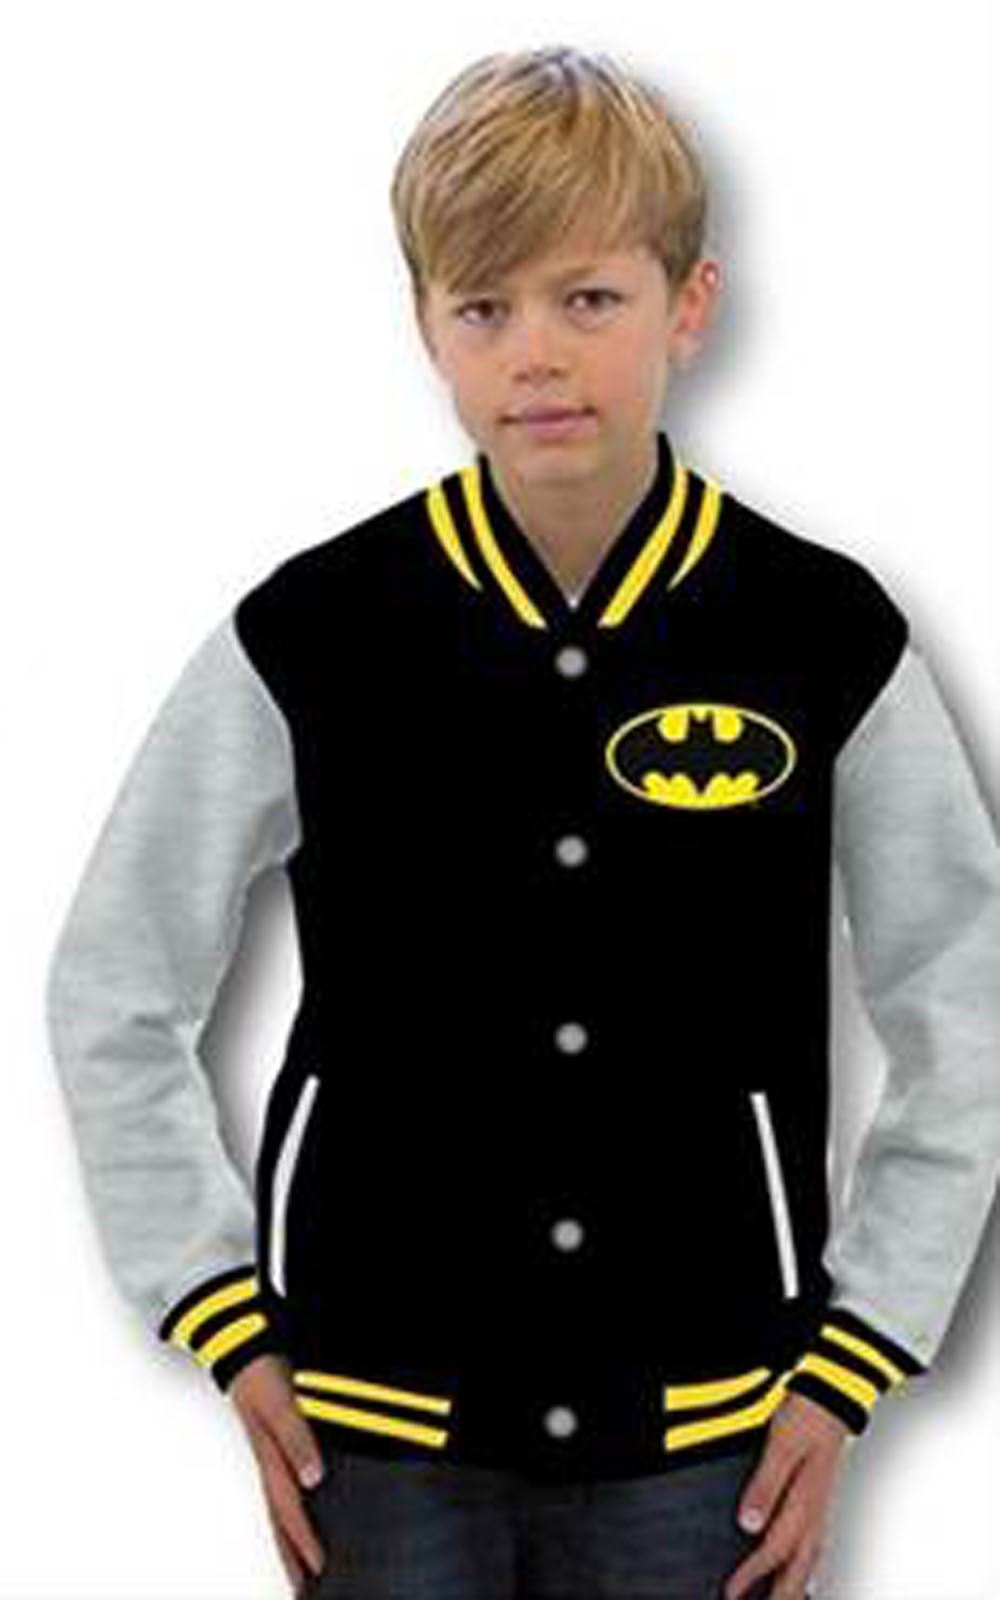 Officiel-enfants-garcons-batman-superman-baseball-veste-manteau-varsity-super-heros